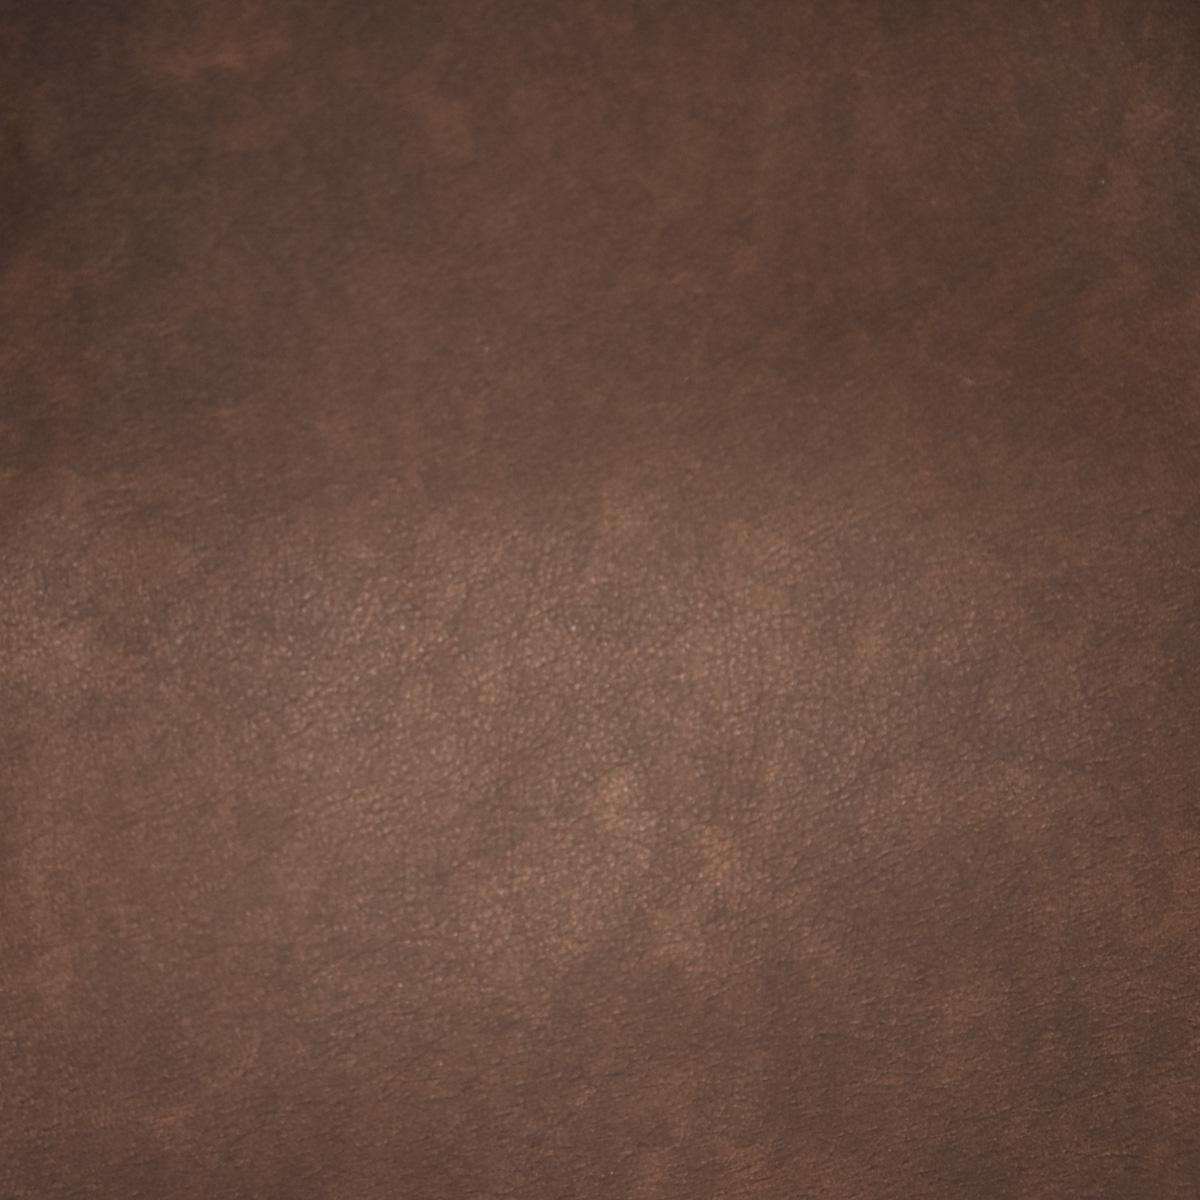 Zugluftstopper Kunstleder Wildlederoptik braun Dunkelbraun gl/änzend Verschiedene Gr/ö/ßen Auswahl:80cm L/änge SCH/ÖNER LEBEN